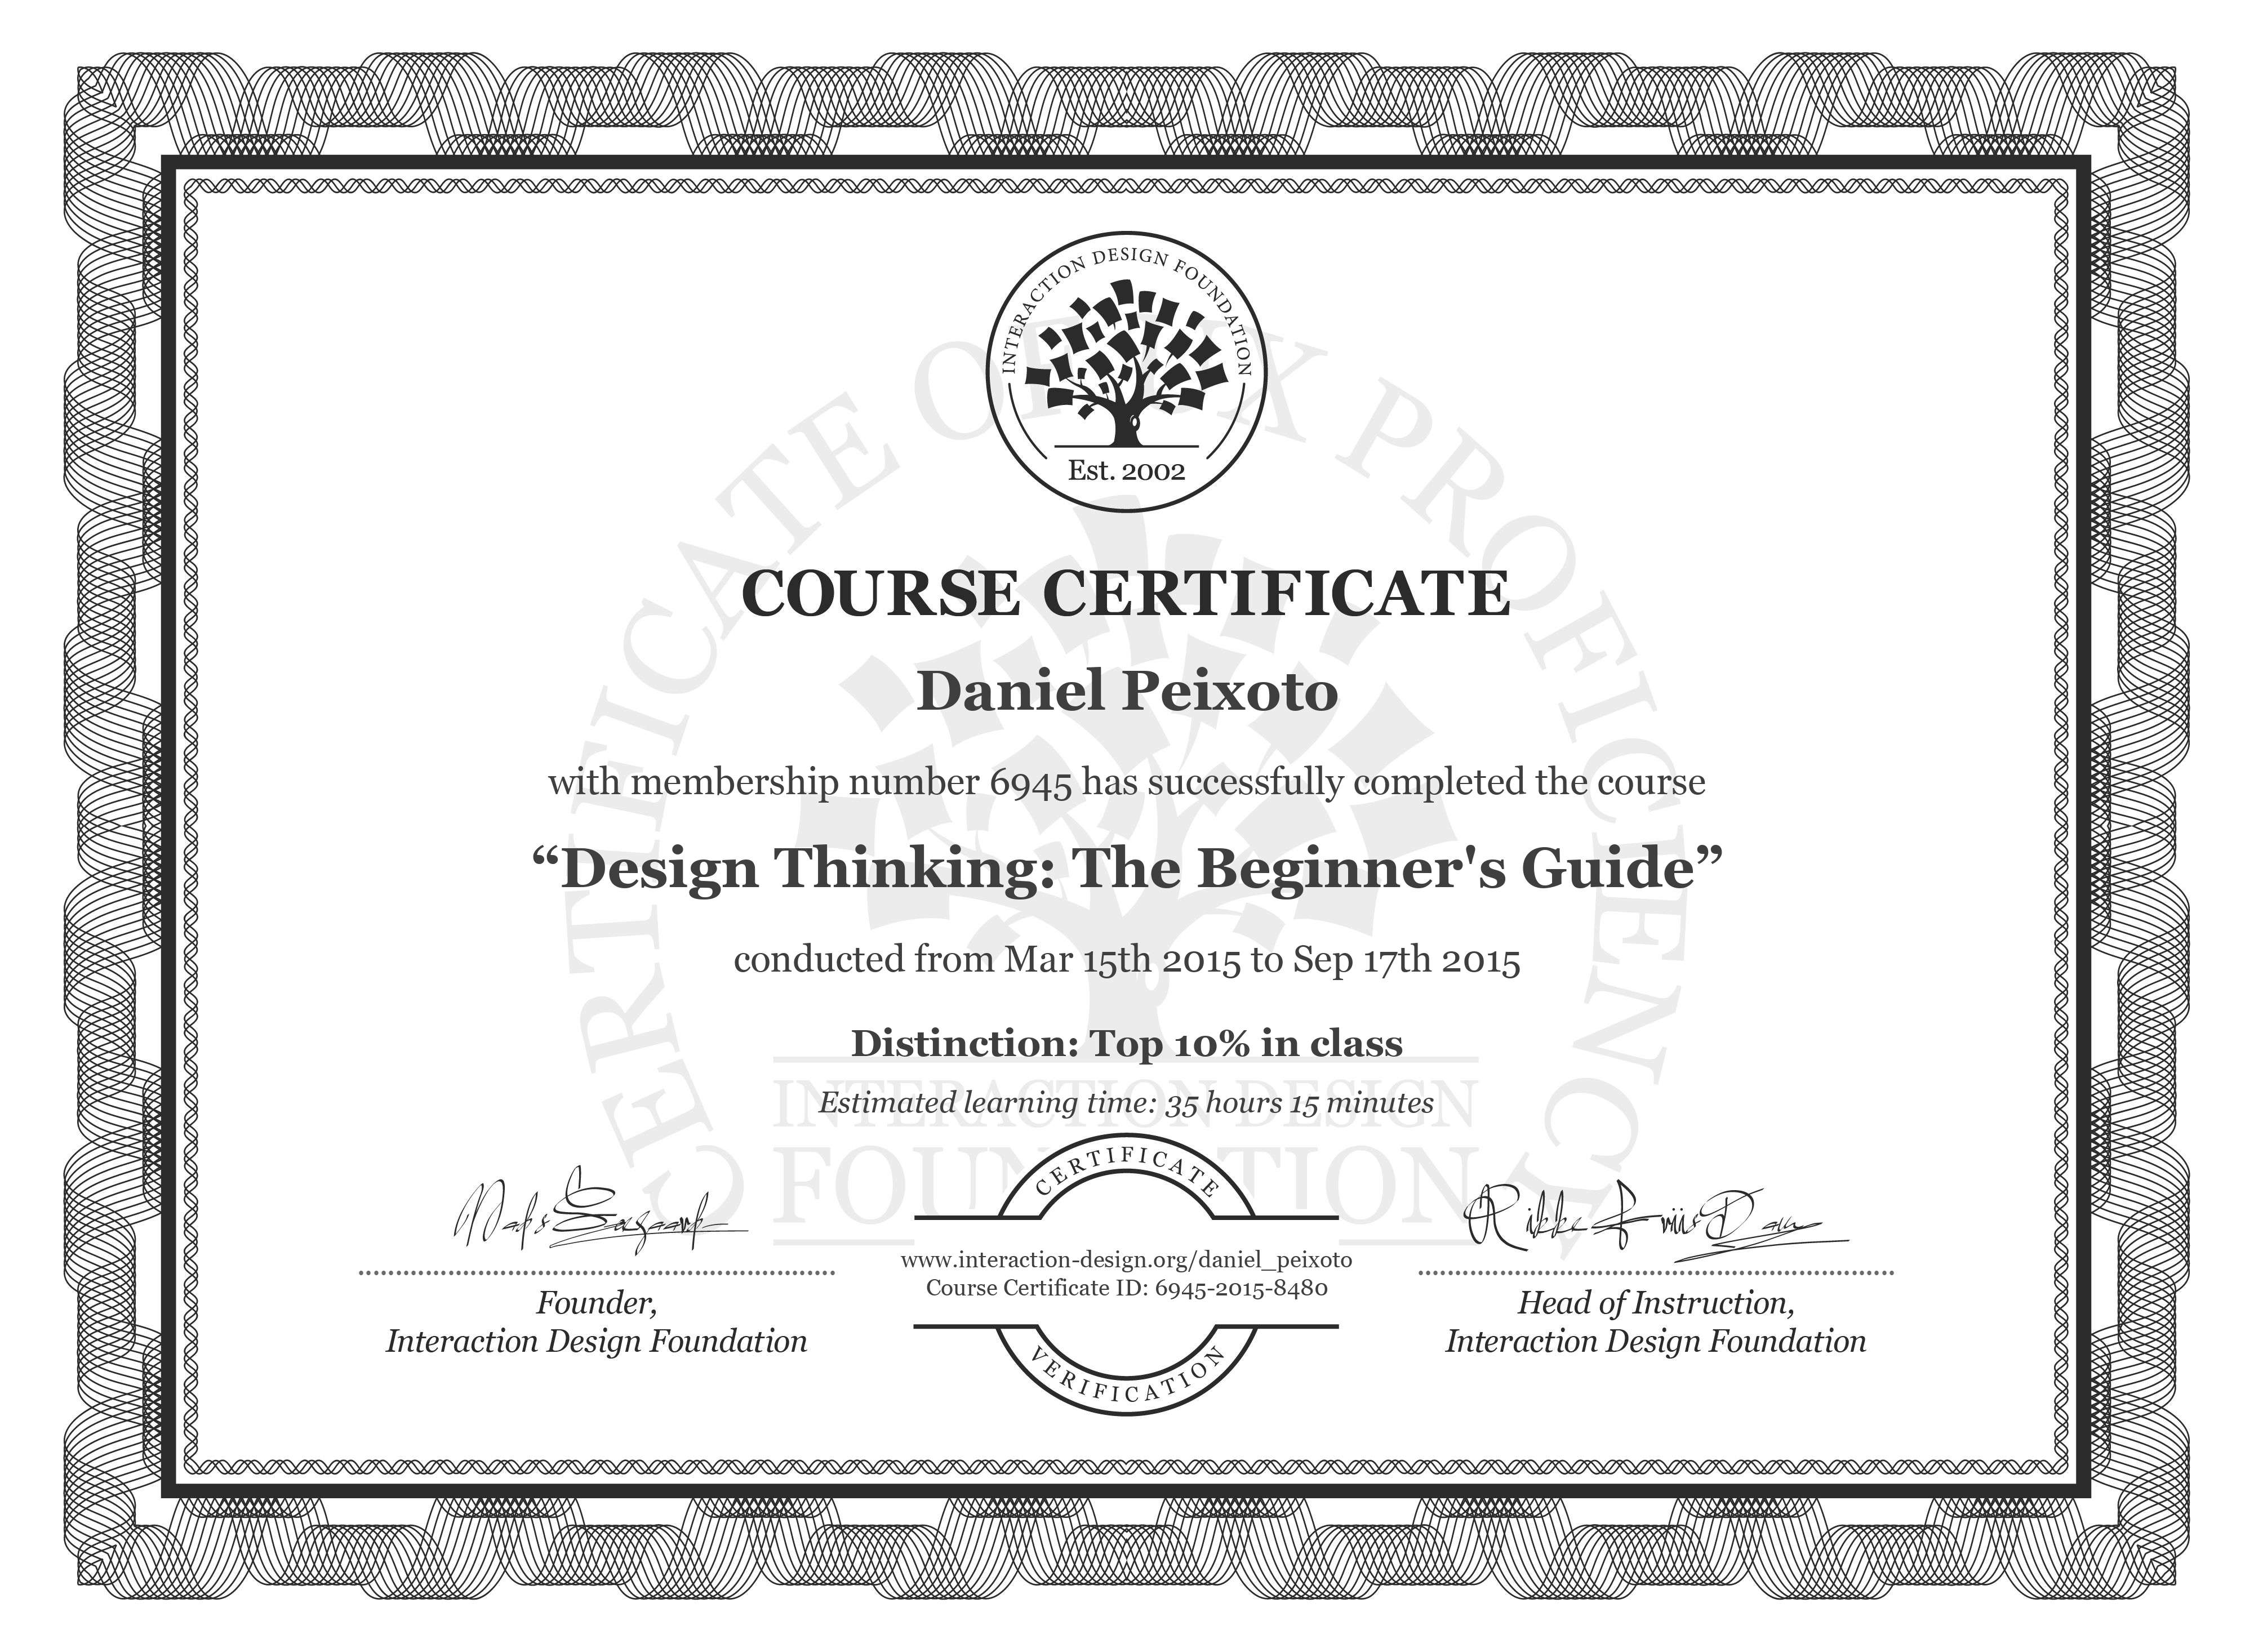 Daniel Peixoto: Course Certificate - Design Thinking: The Beginner's Guide